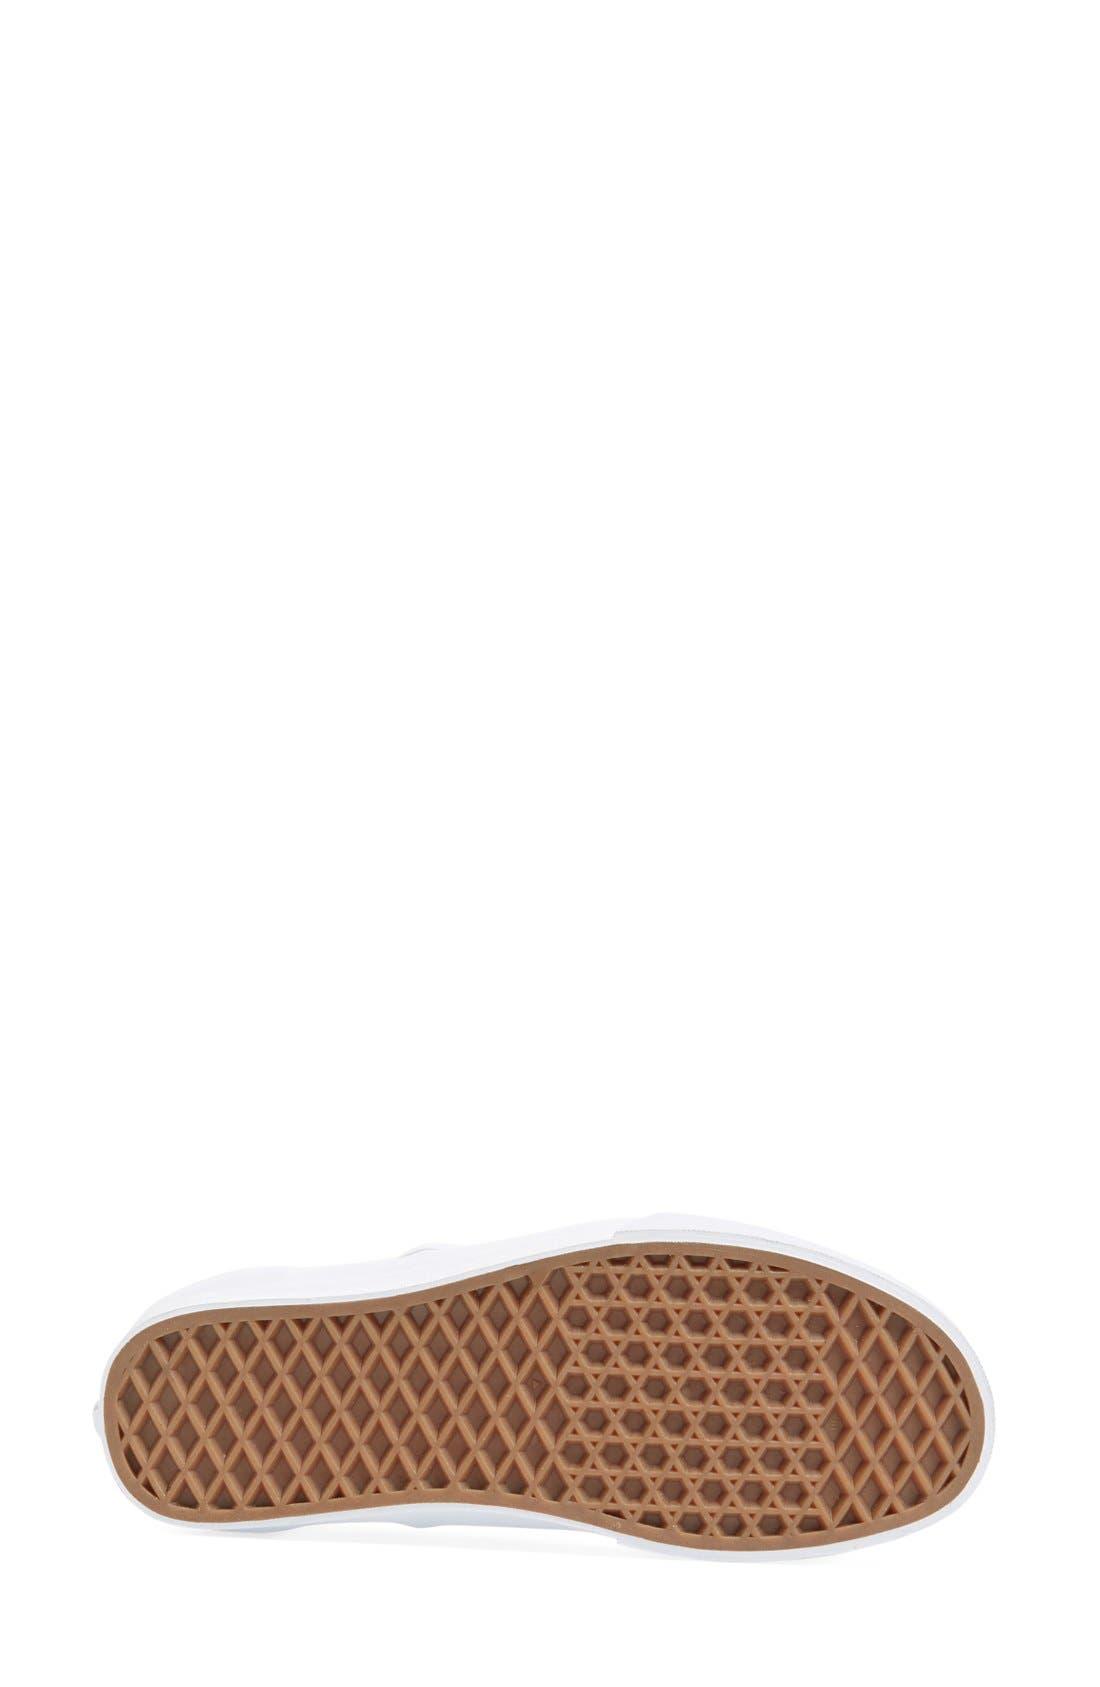 Alternate Image 4  - Vans Metallic Leather Slip-On Sneaker (Women)